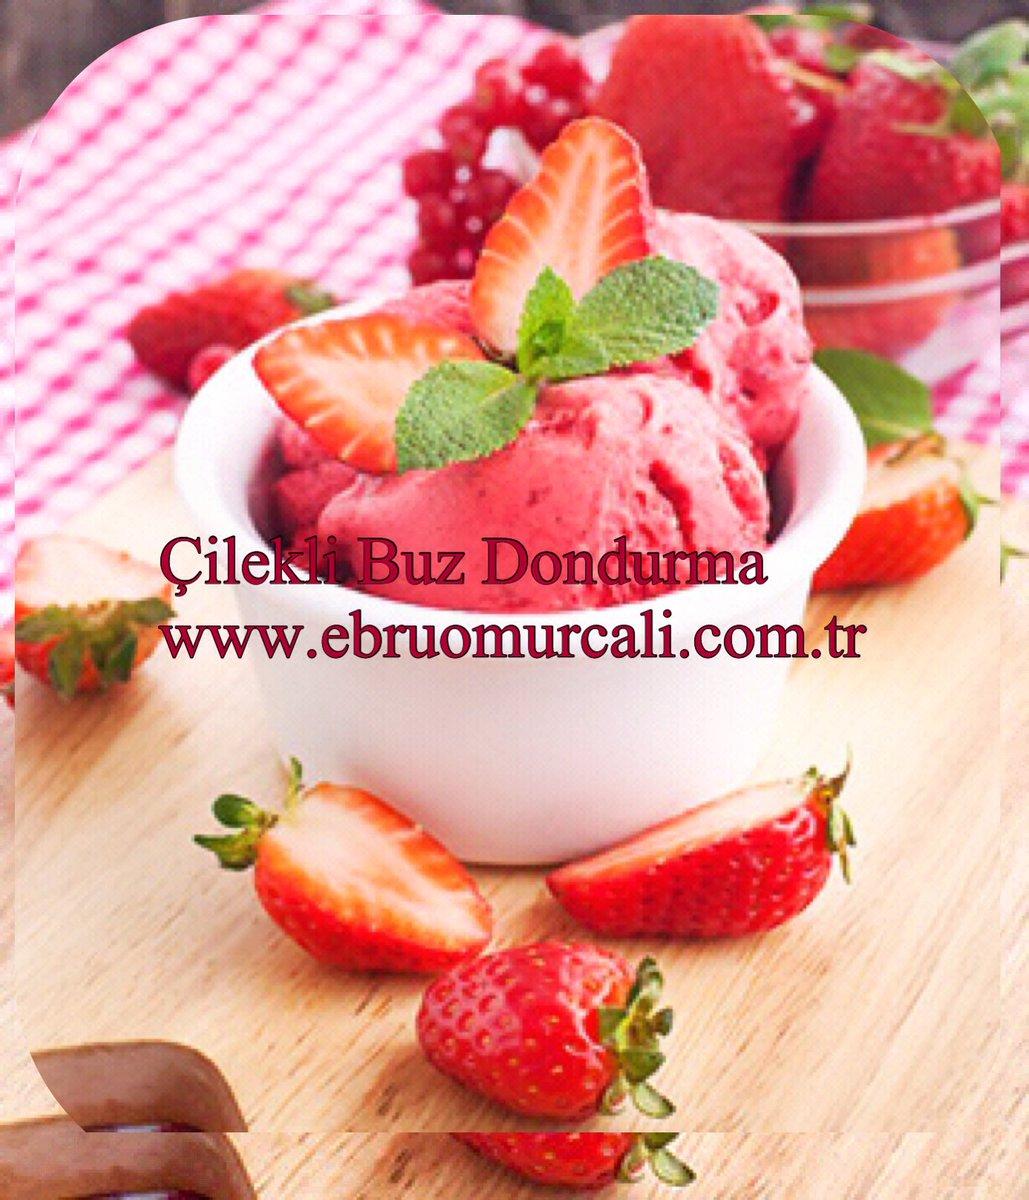 Рецепт молочного мороженого с клубникой в домашних условиях